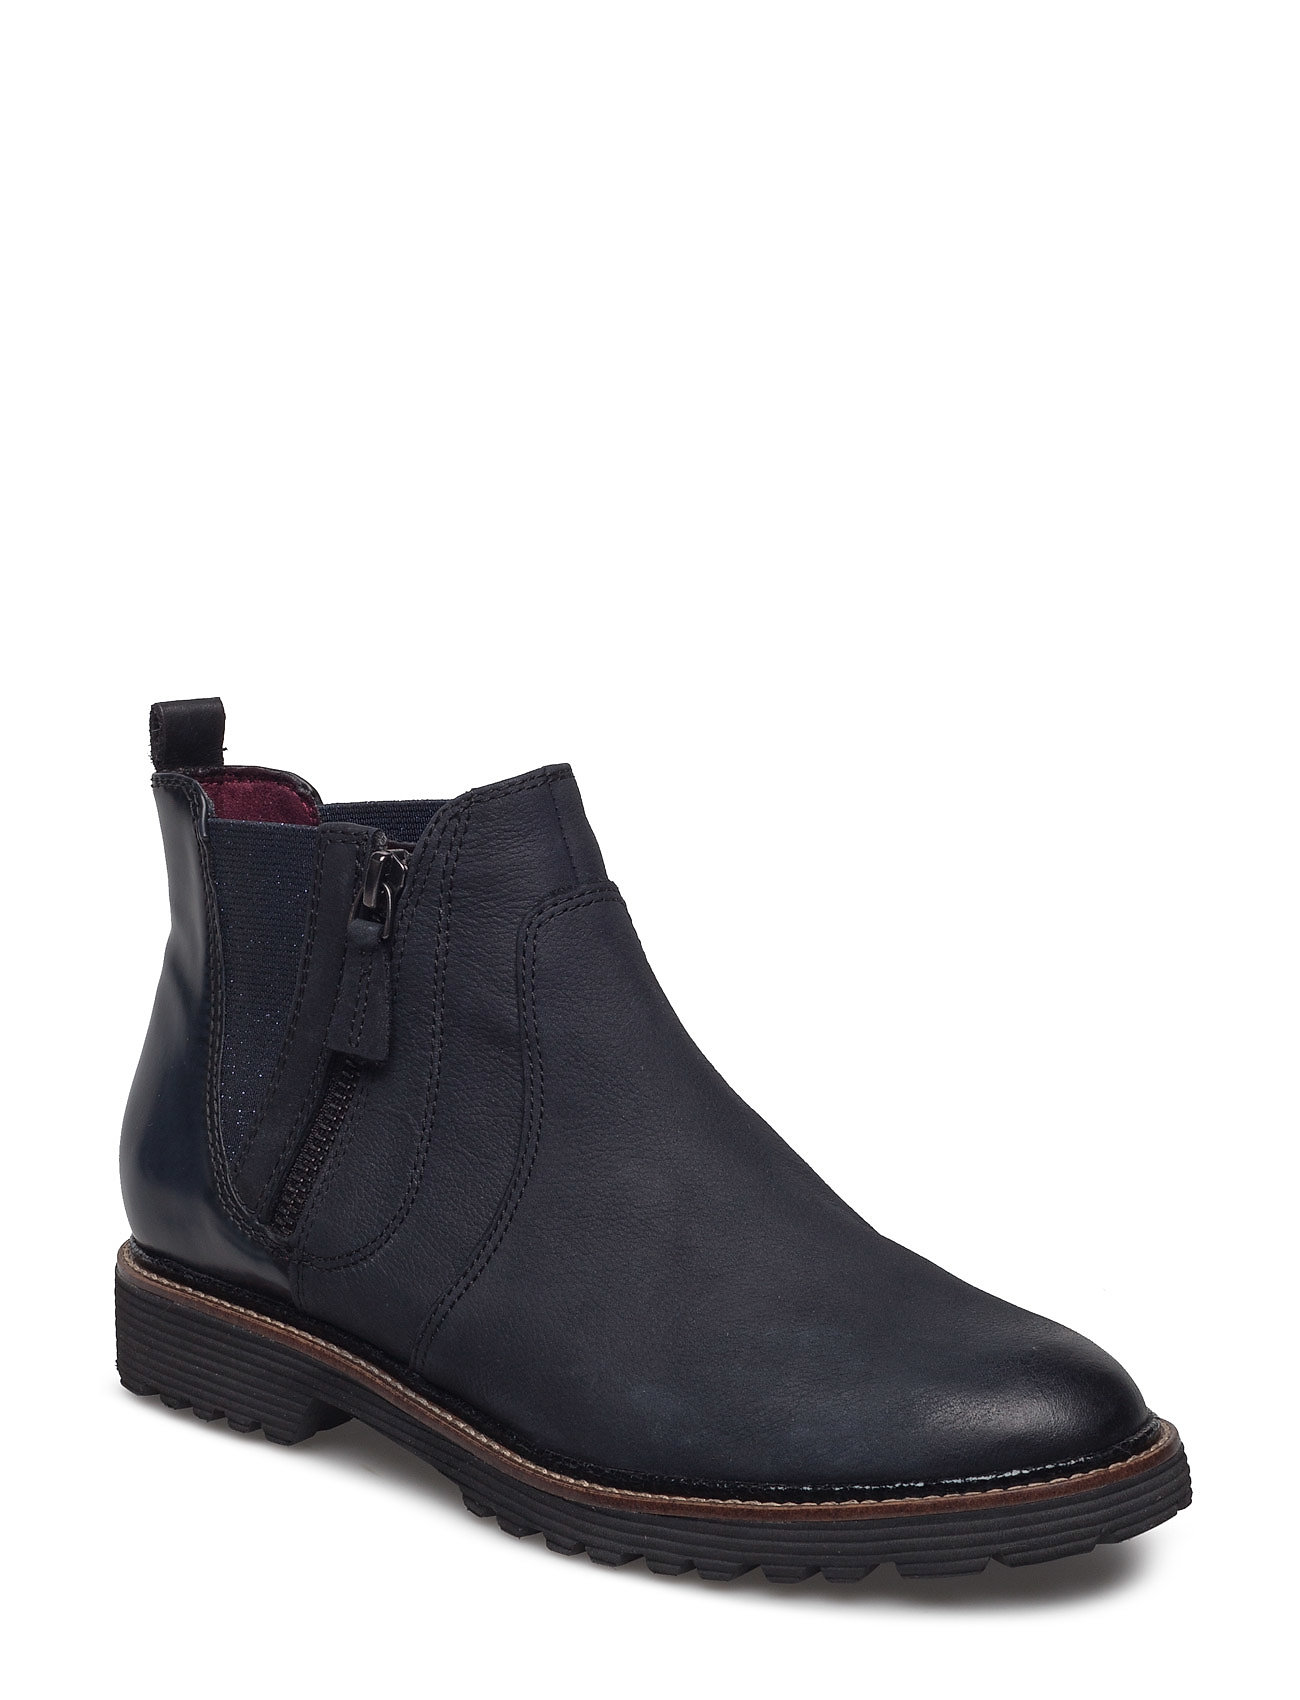 Woms Boots Tamaris Støvler til Damer i Navy blå